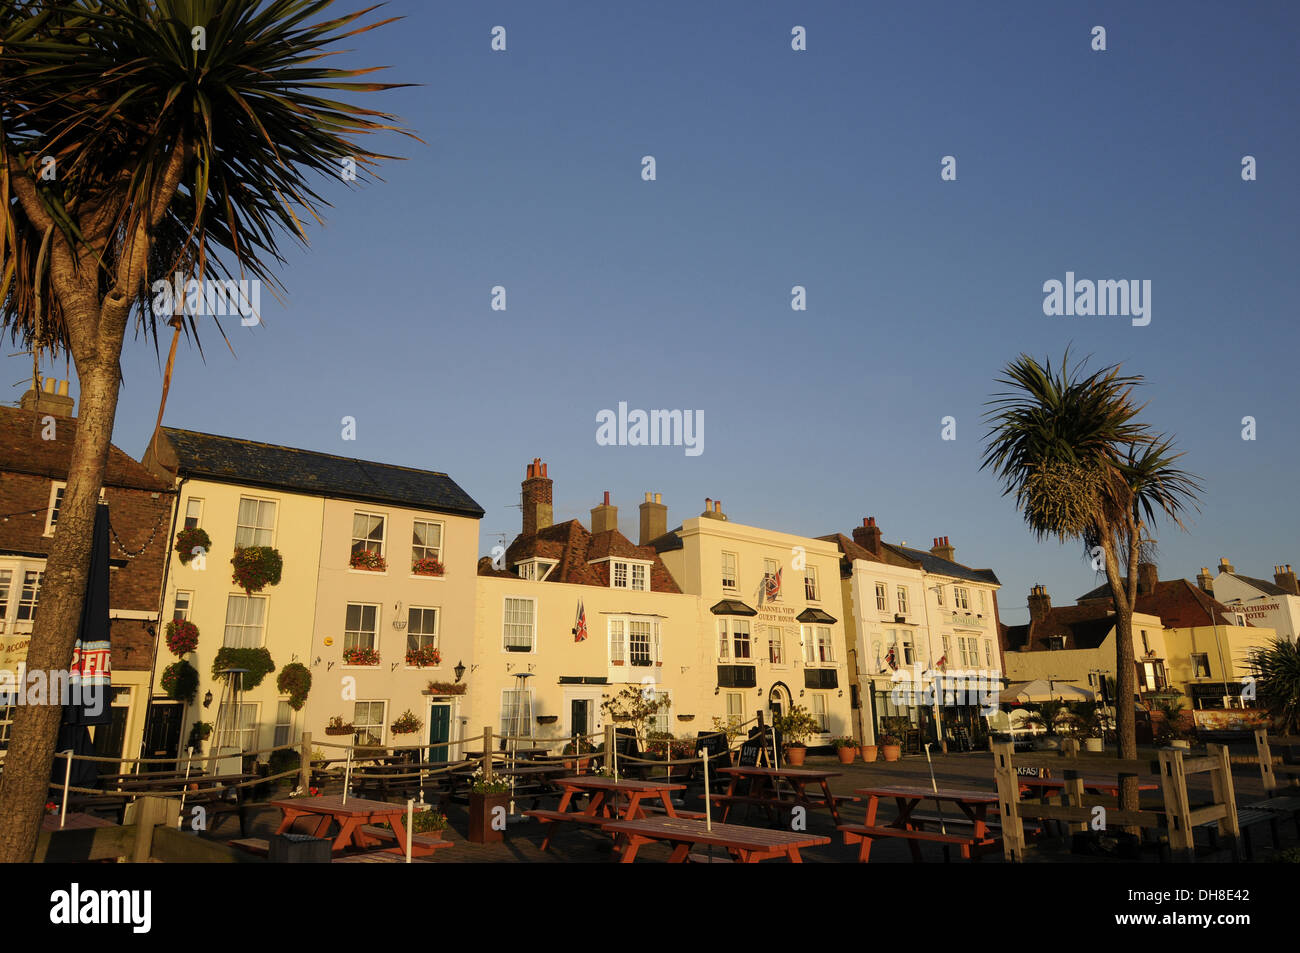 Restaurants and Hotels on Beach Street Deal Kent England - Stock Image